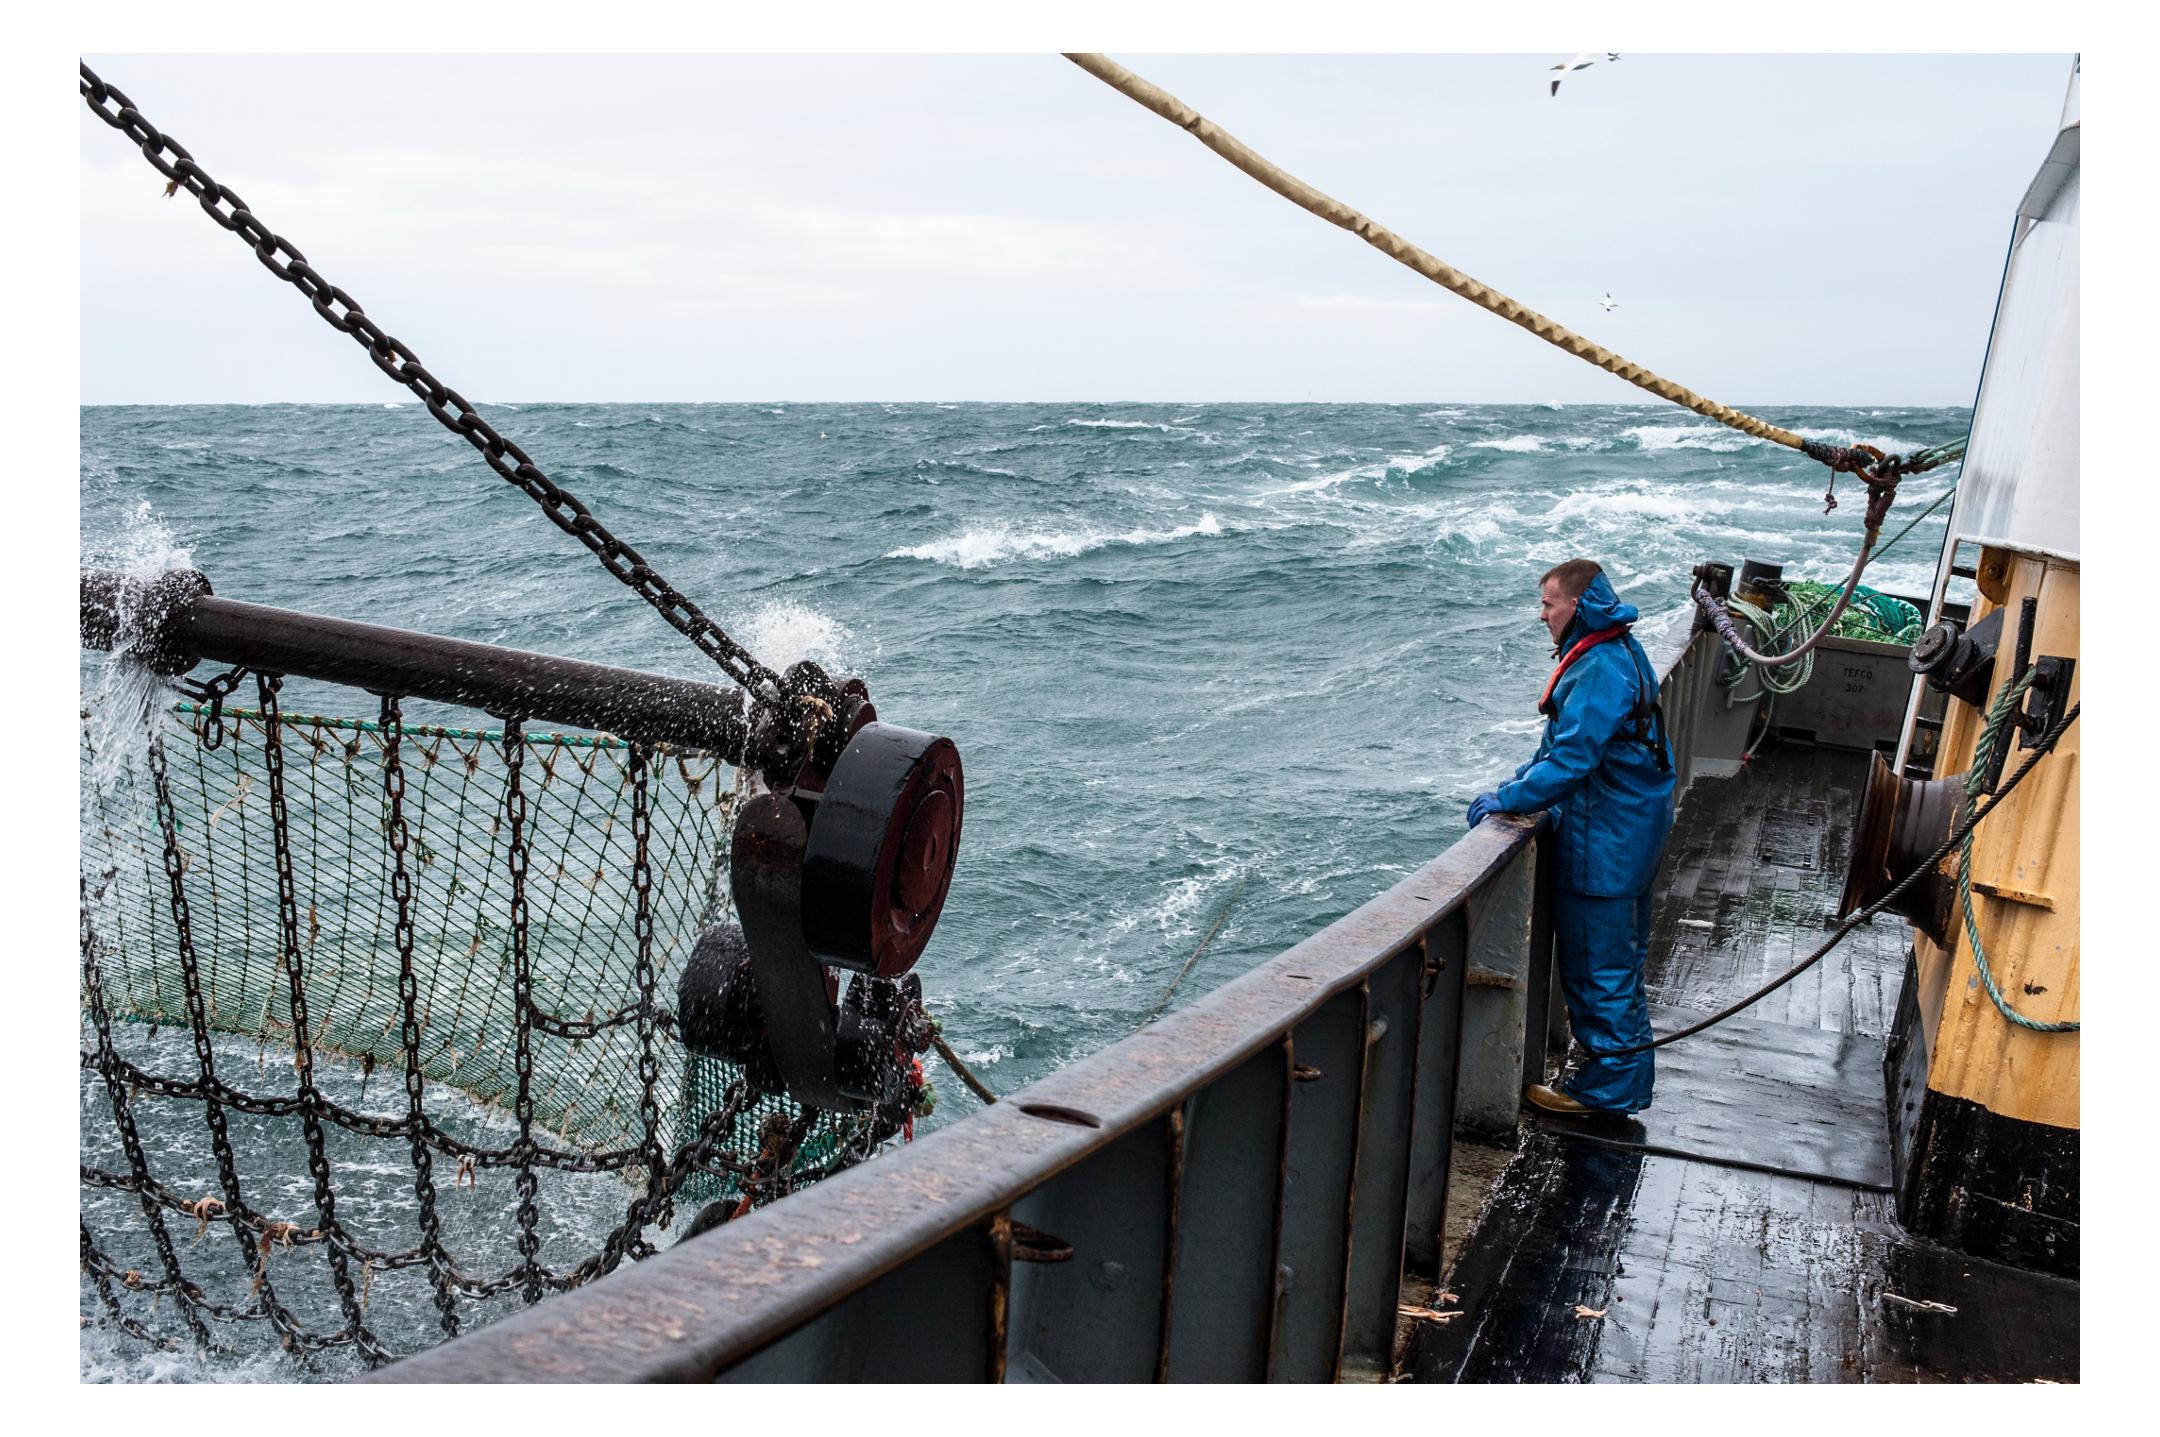 waterdance_beam_trawlers_3.jpg